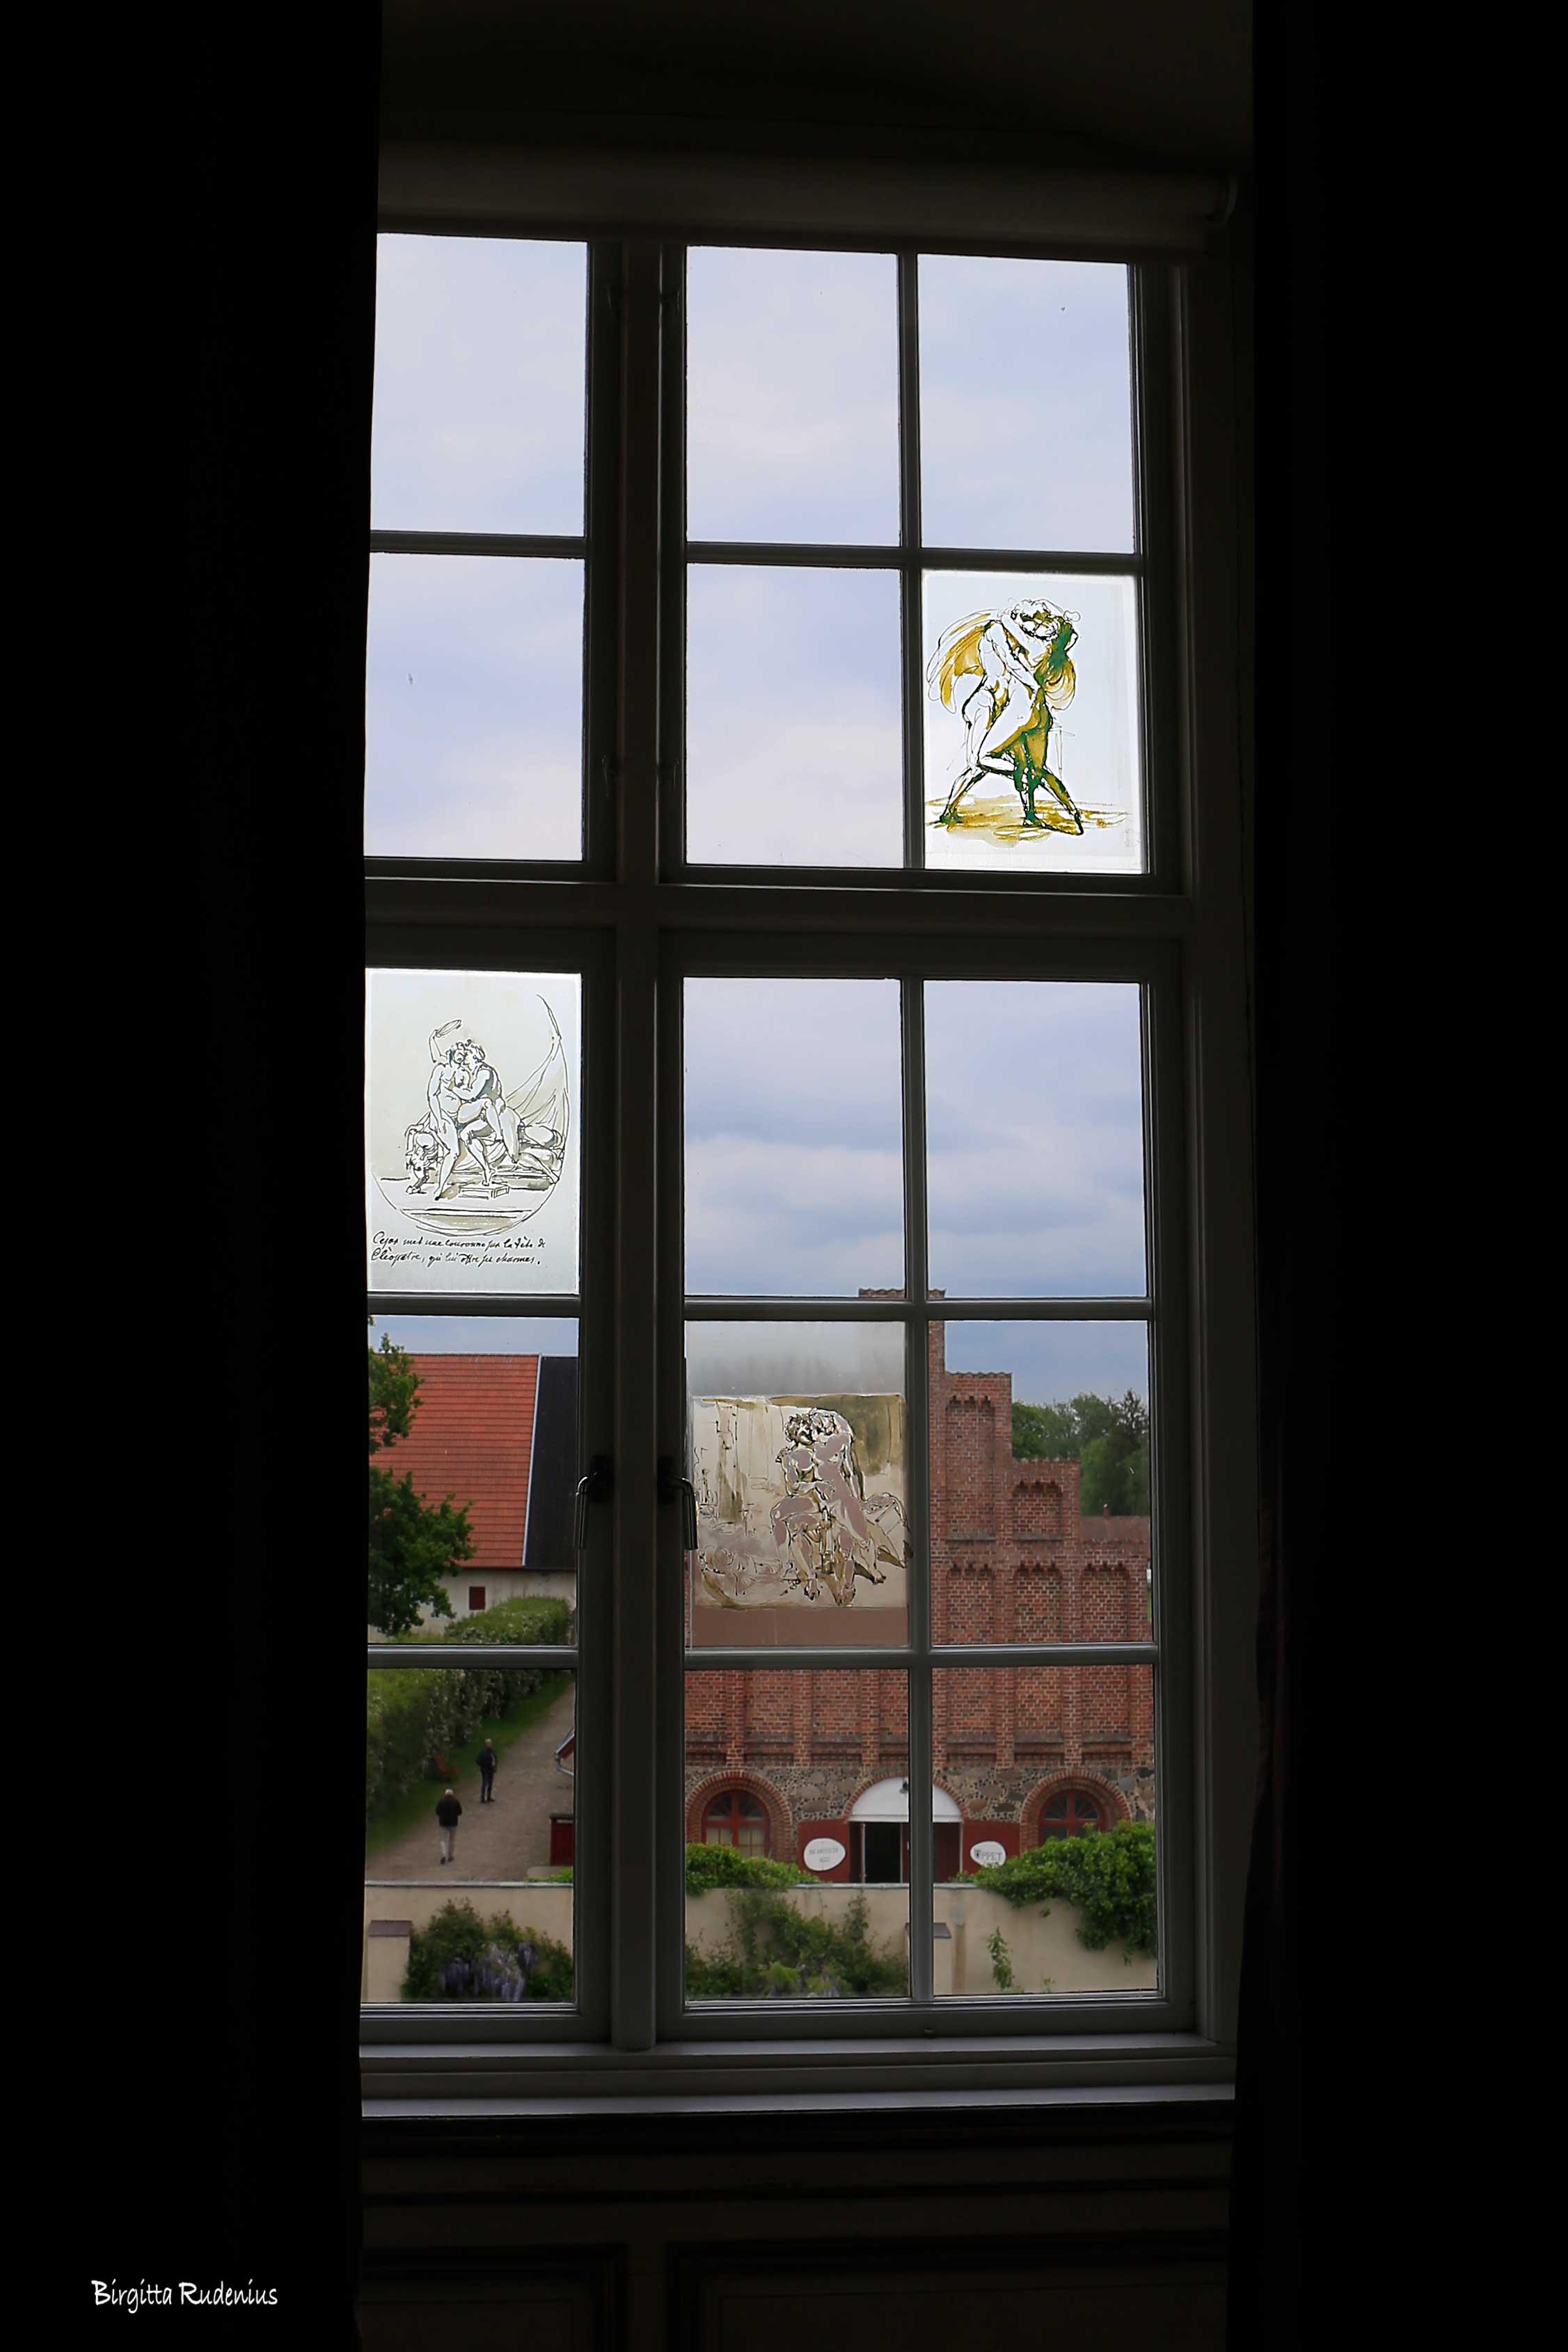 Erotisk konst på fönster. Skarshult Slott, Eslöv, Skåne.